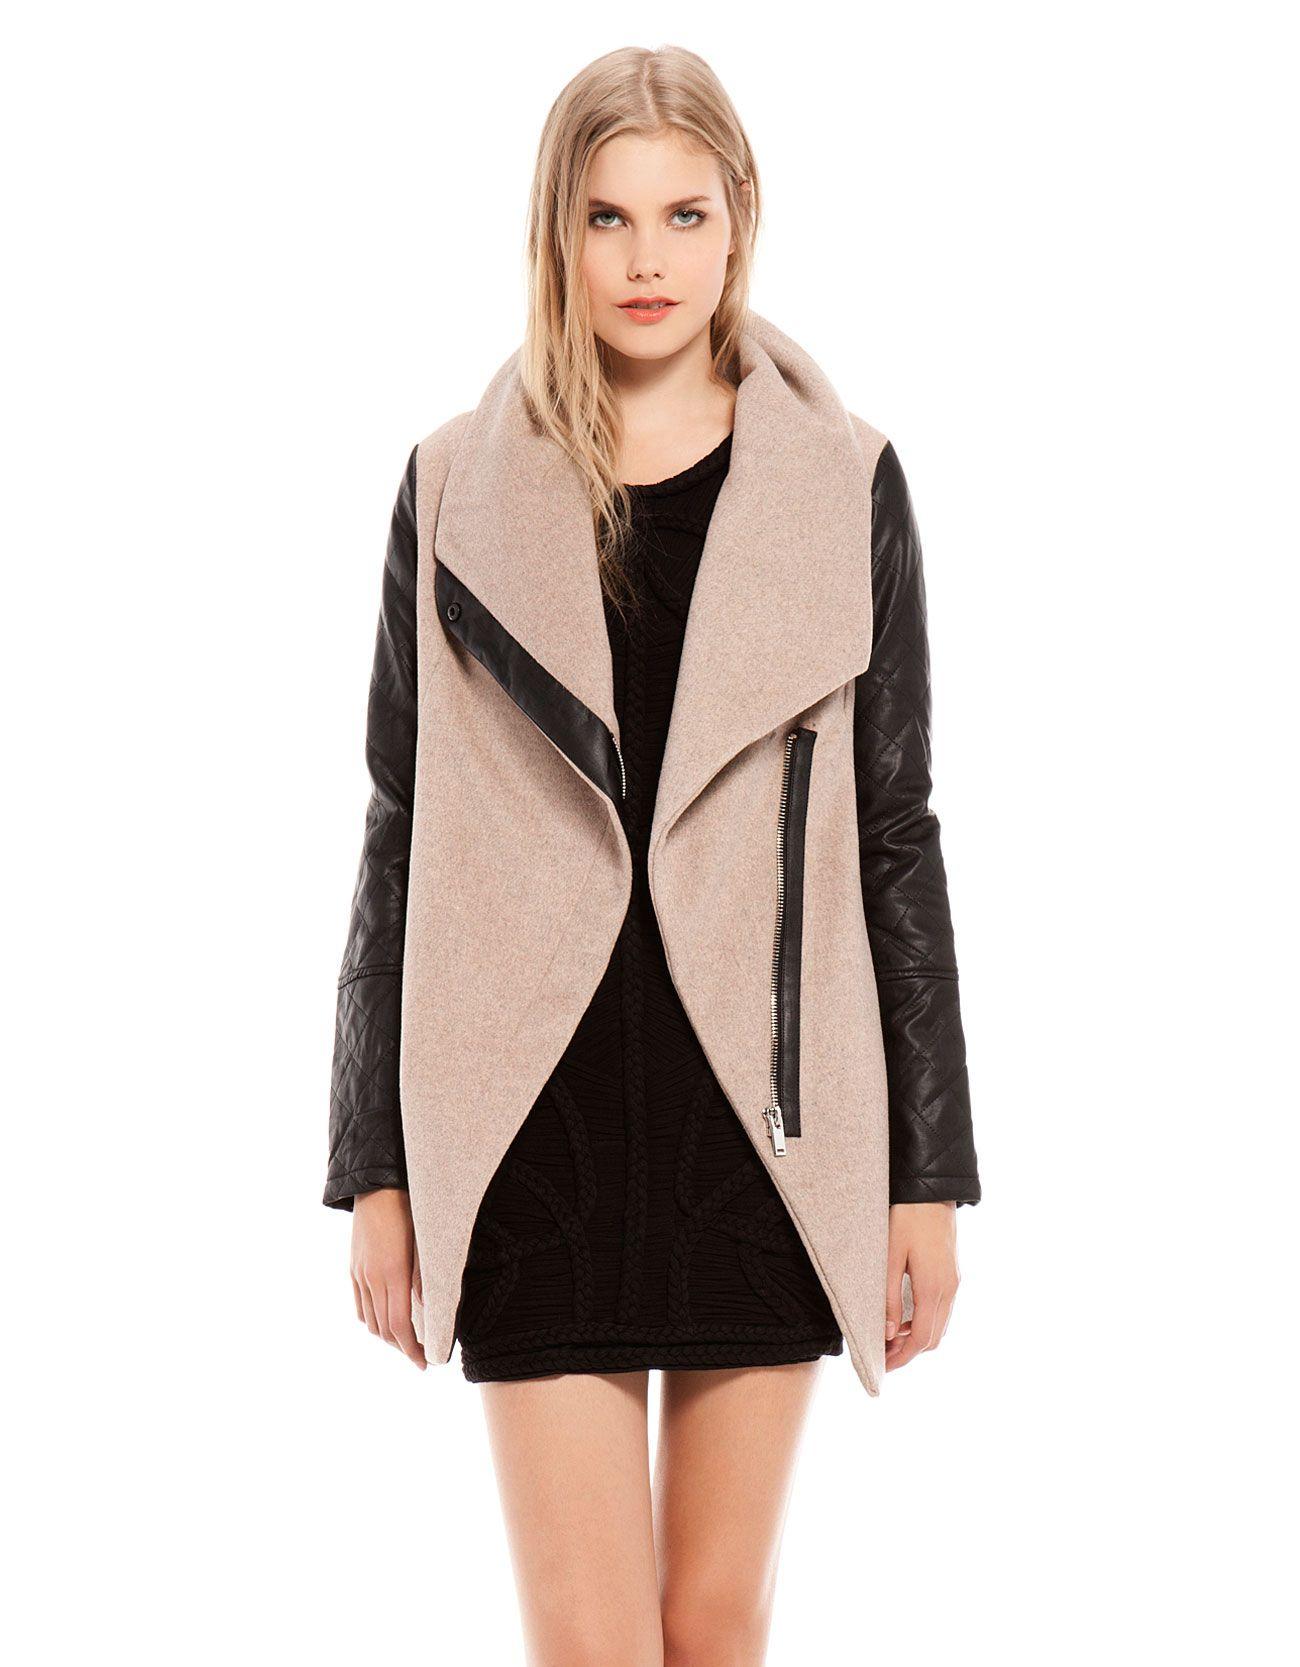 Bershka espa a abrigo bershka detalle cremallera invierno pinterest bershka abrigo - Comprar ropa en portugal ...